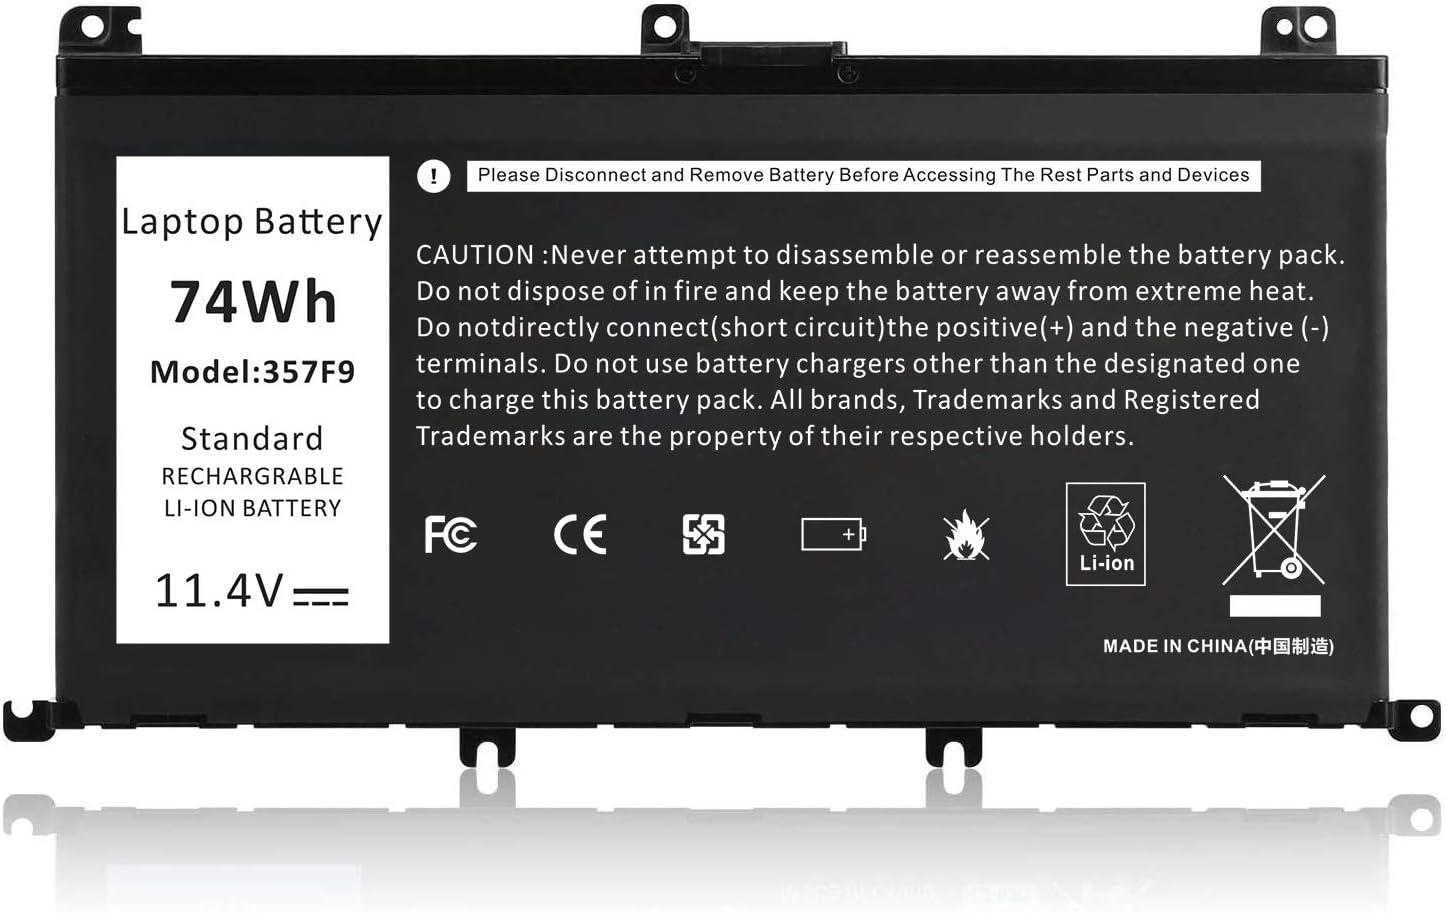 Type 357F9 0GFJ6 71JF4 Battery for Dell Dell Inspiron 7000 Dump 15 7566 7567 7557 7559 I7559 5576 5577 INS15PD-1548B 1548R 1748B 1748R 2548R 2548B 2748R